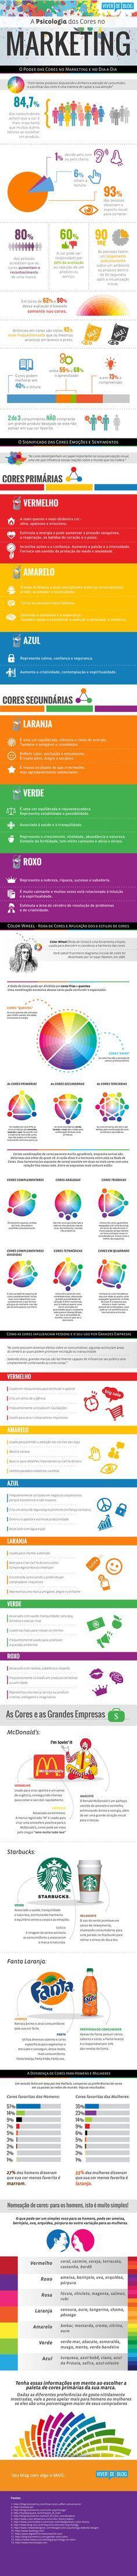 Infográfico: A Psicologia das Cores A Psicologia das Cores no Marketing e no Dia-a-Dia. Fonte: Viver de Blog